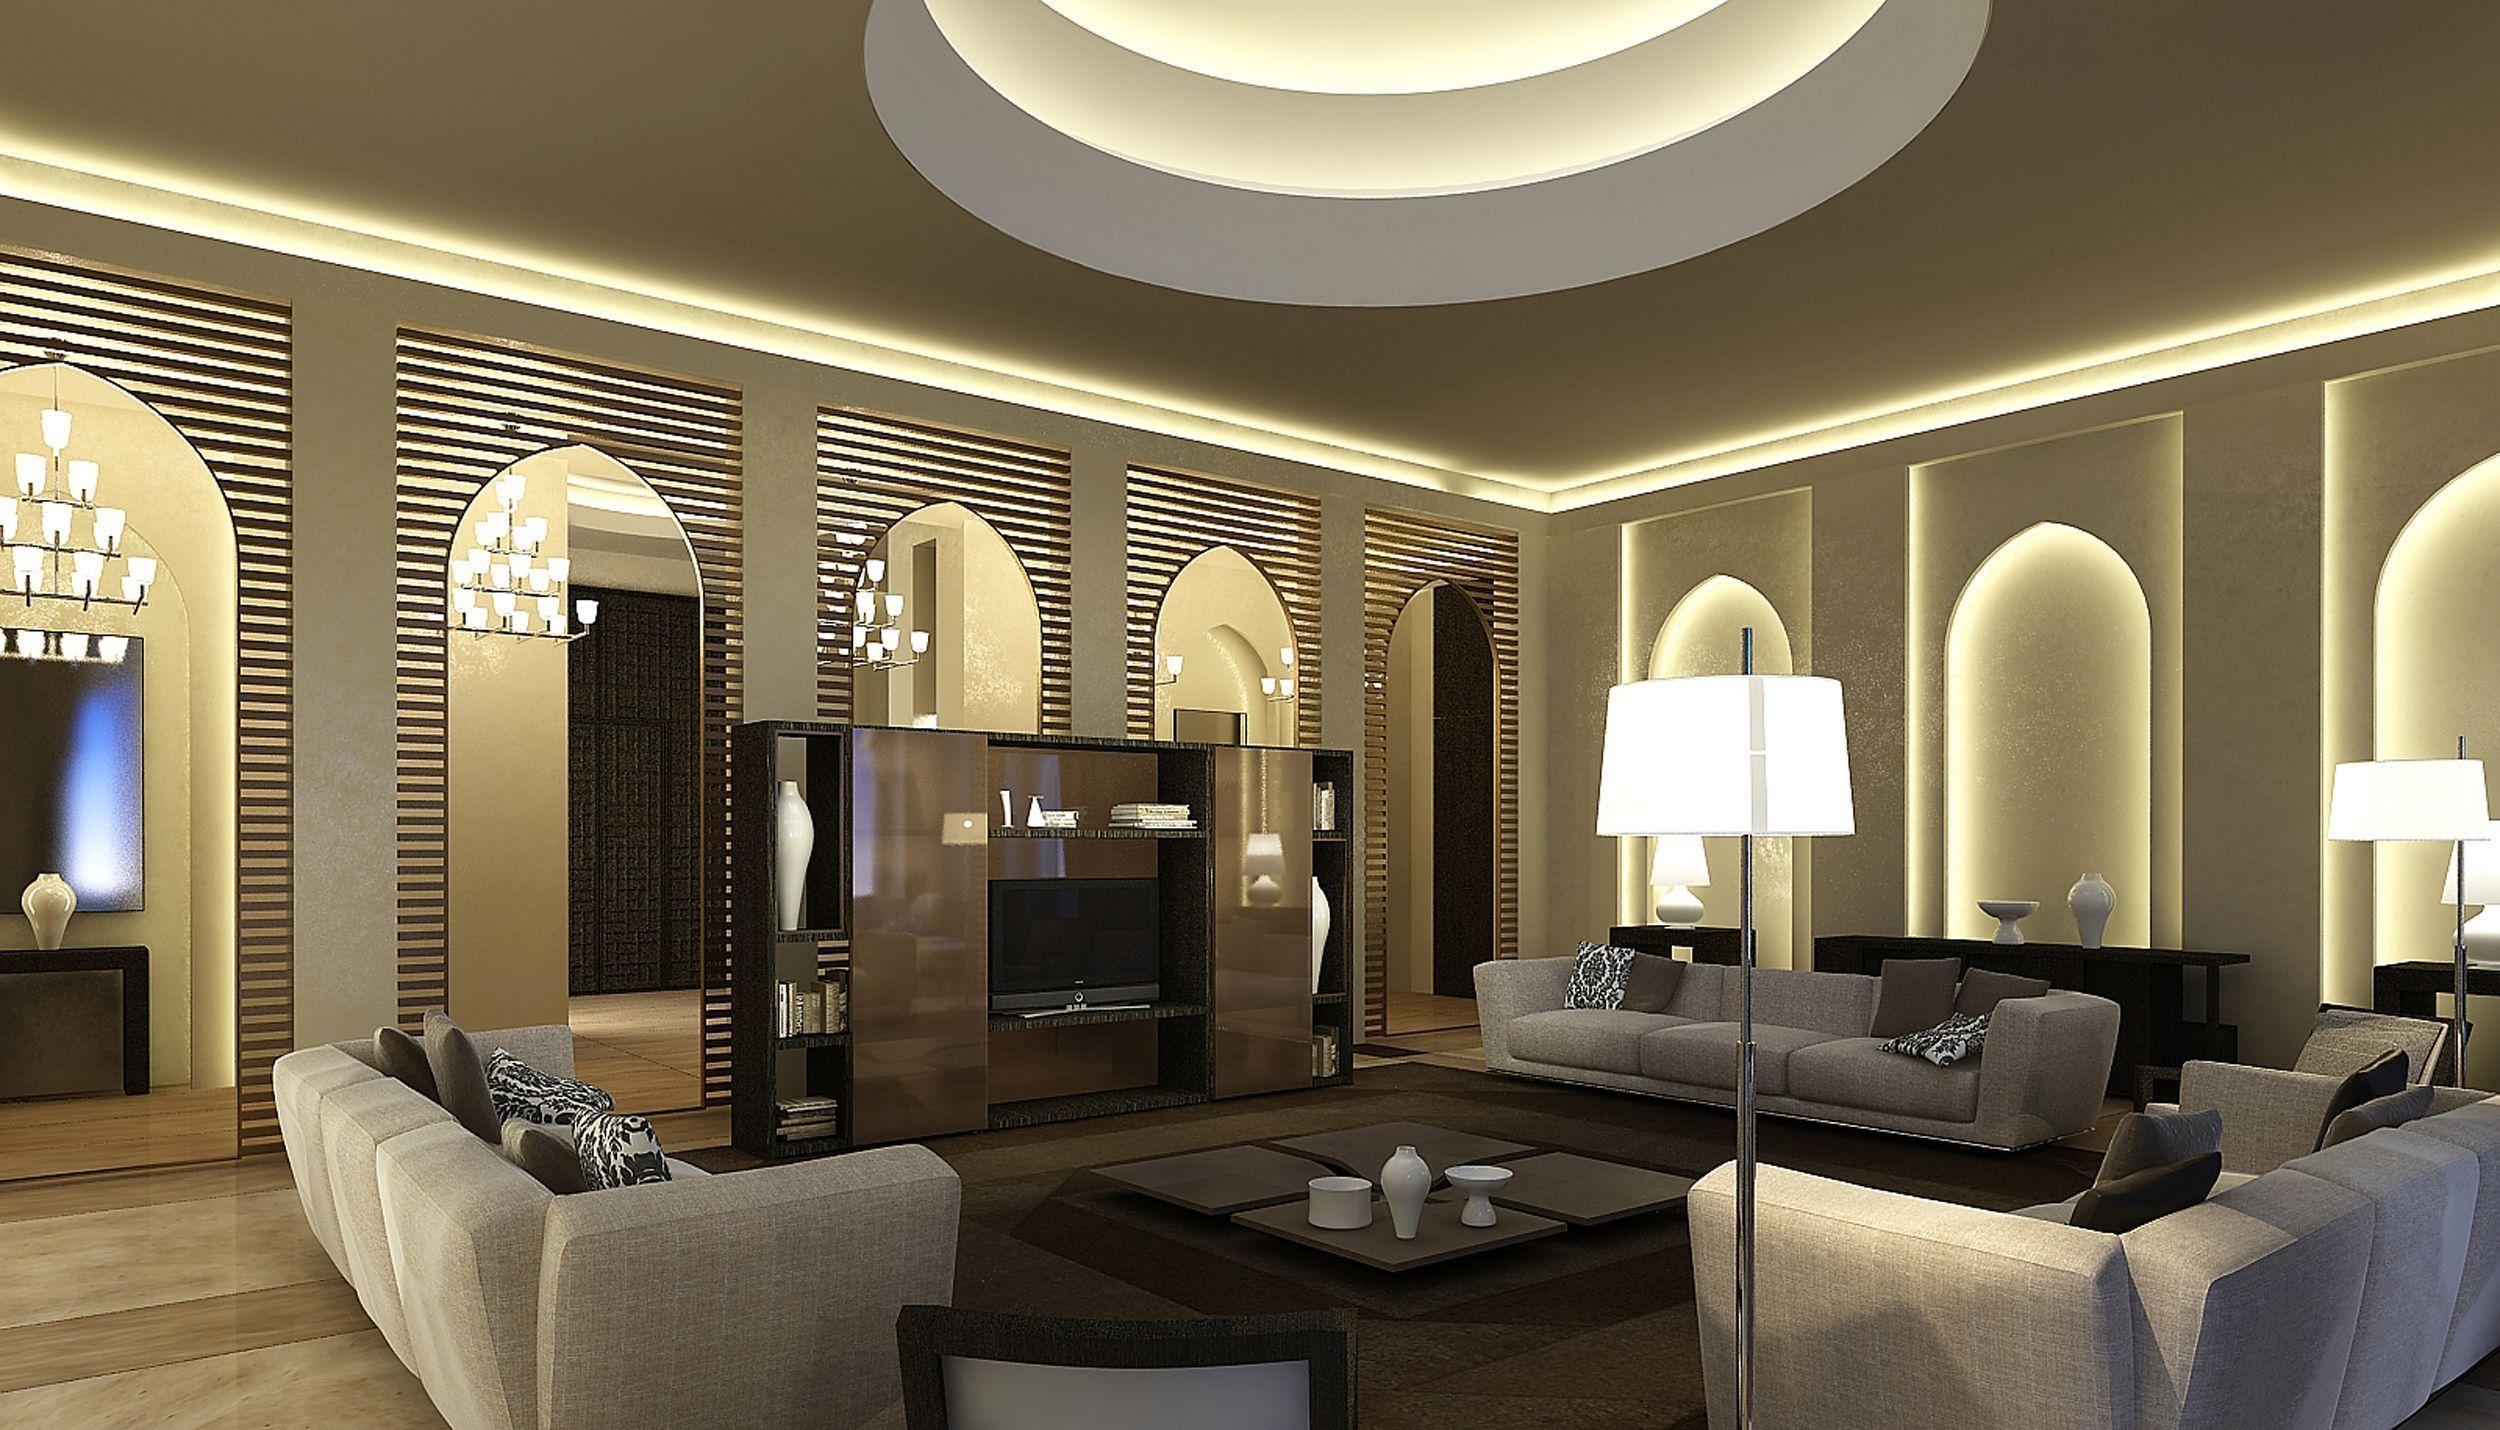 Home Interior Decorators Dubai With Images Contemporary House